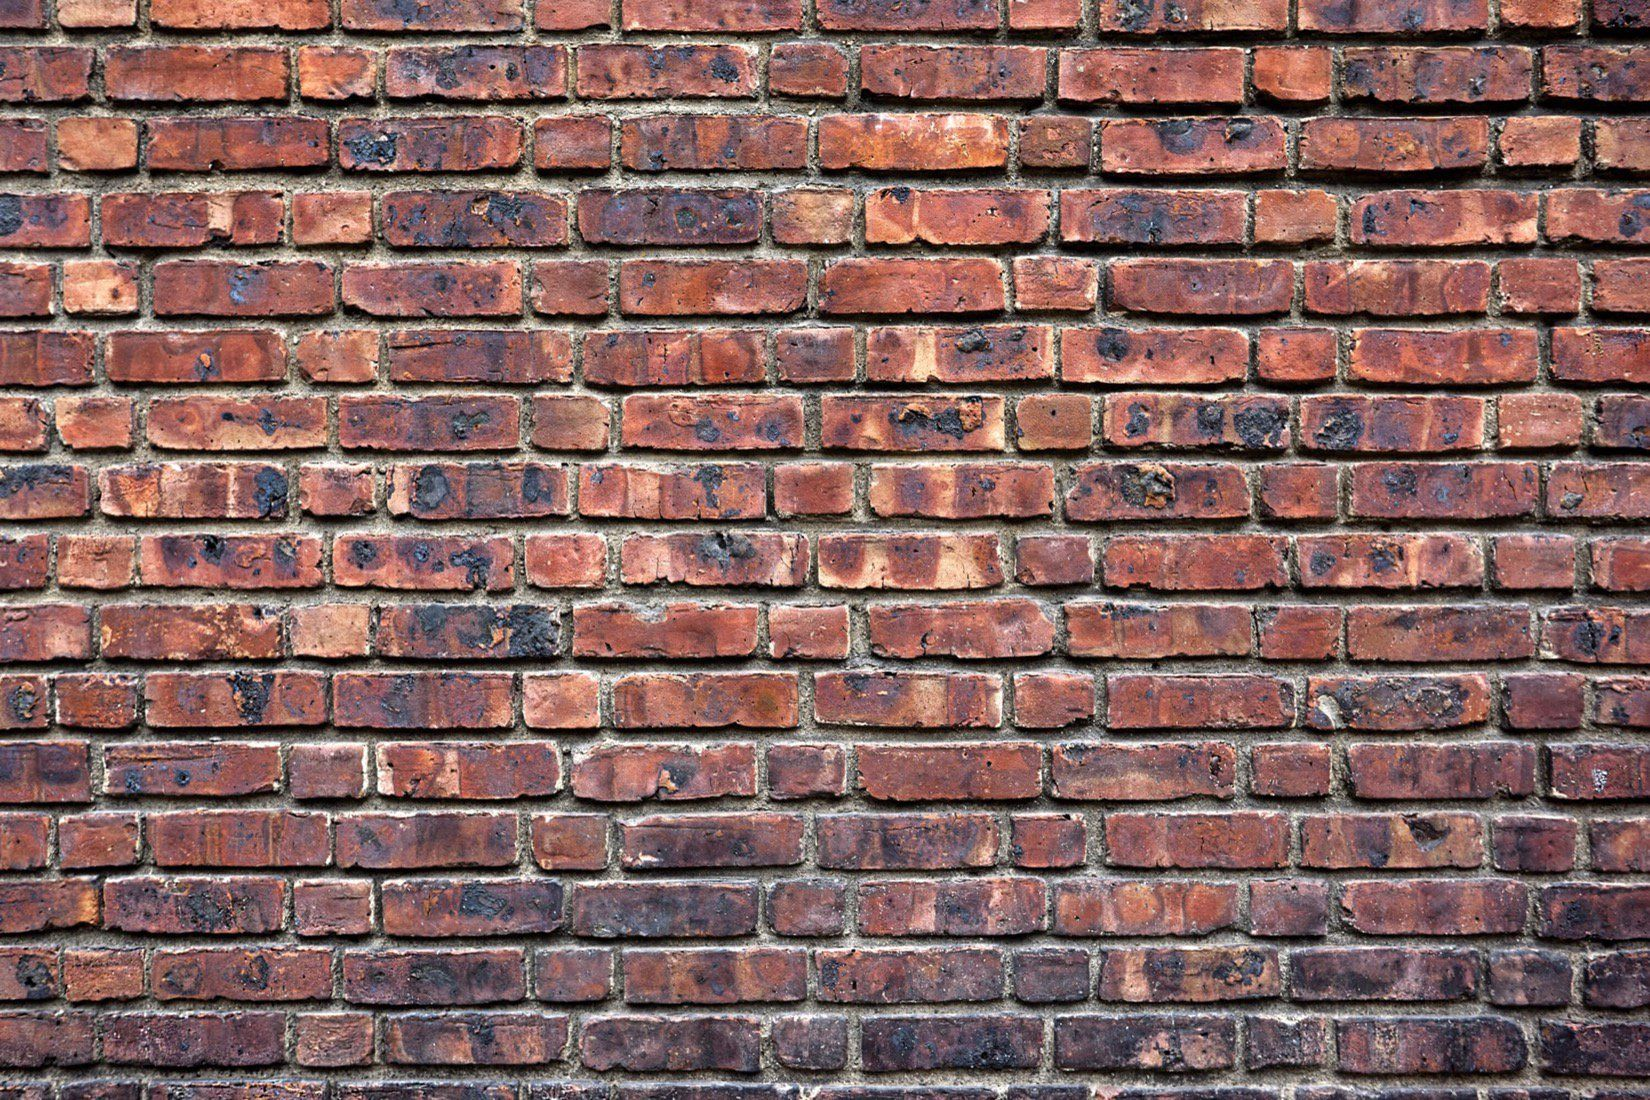 Textured Red Brick Wallpaper Muralswallpaper Red Brick Walls Red Brick Wallpaper Brick Wall